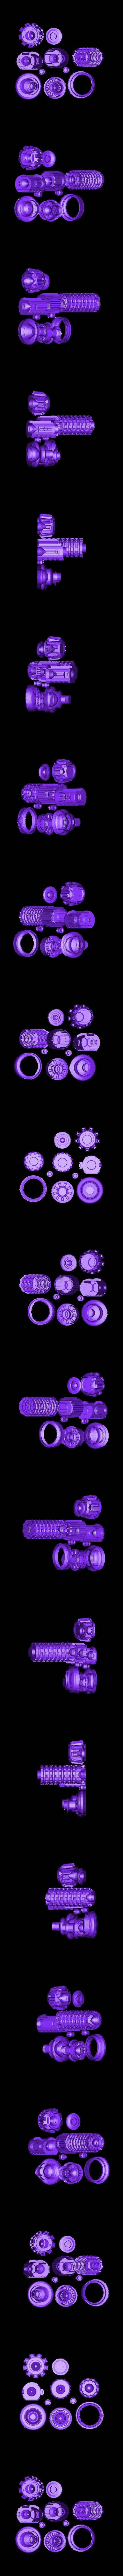 garde_sabrolaser.STL Télécharger fichier STL gratuit Sabre Laser • Design pour impression 3D, Makershop